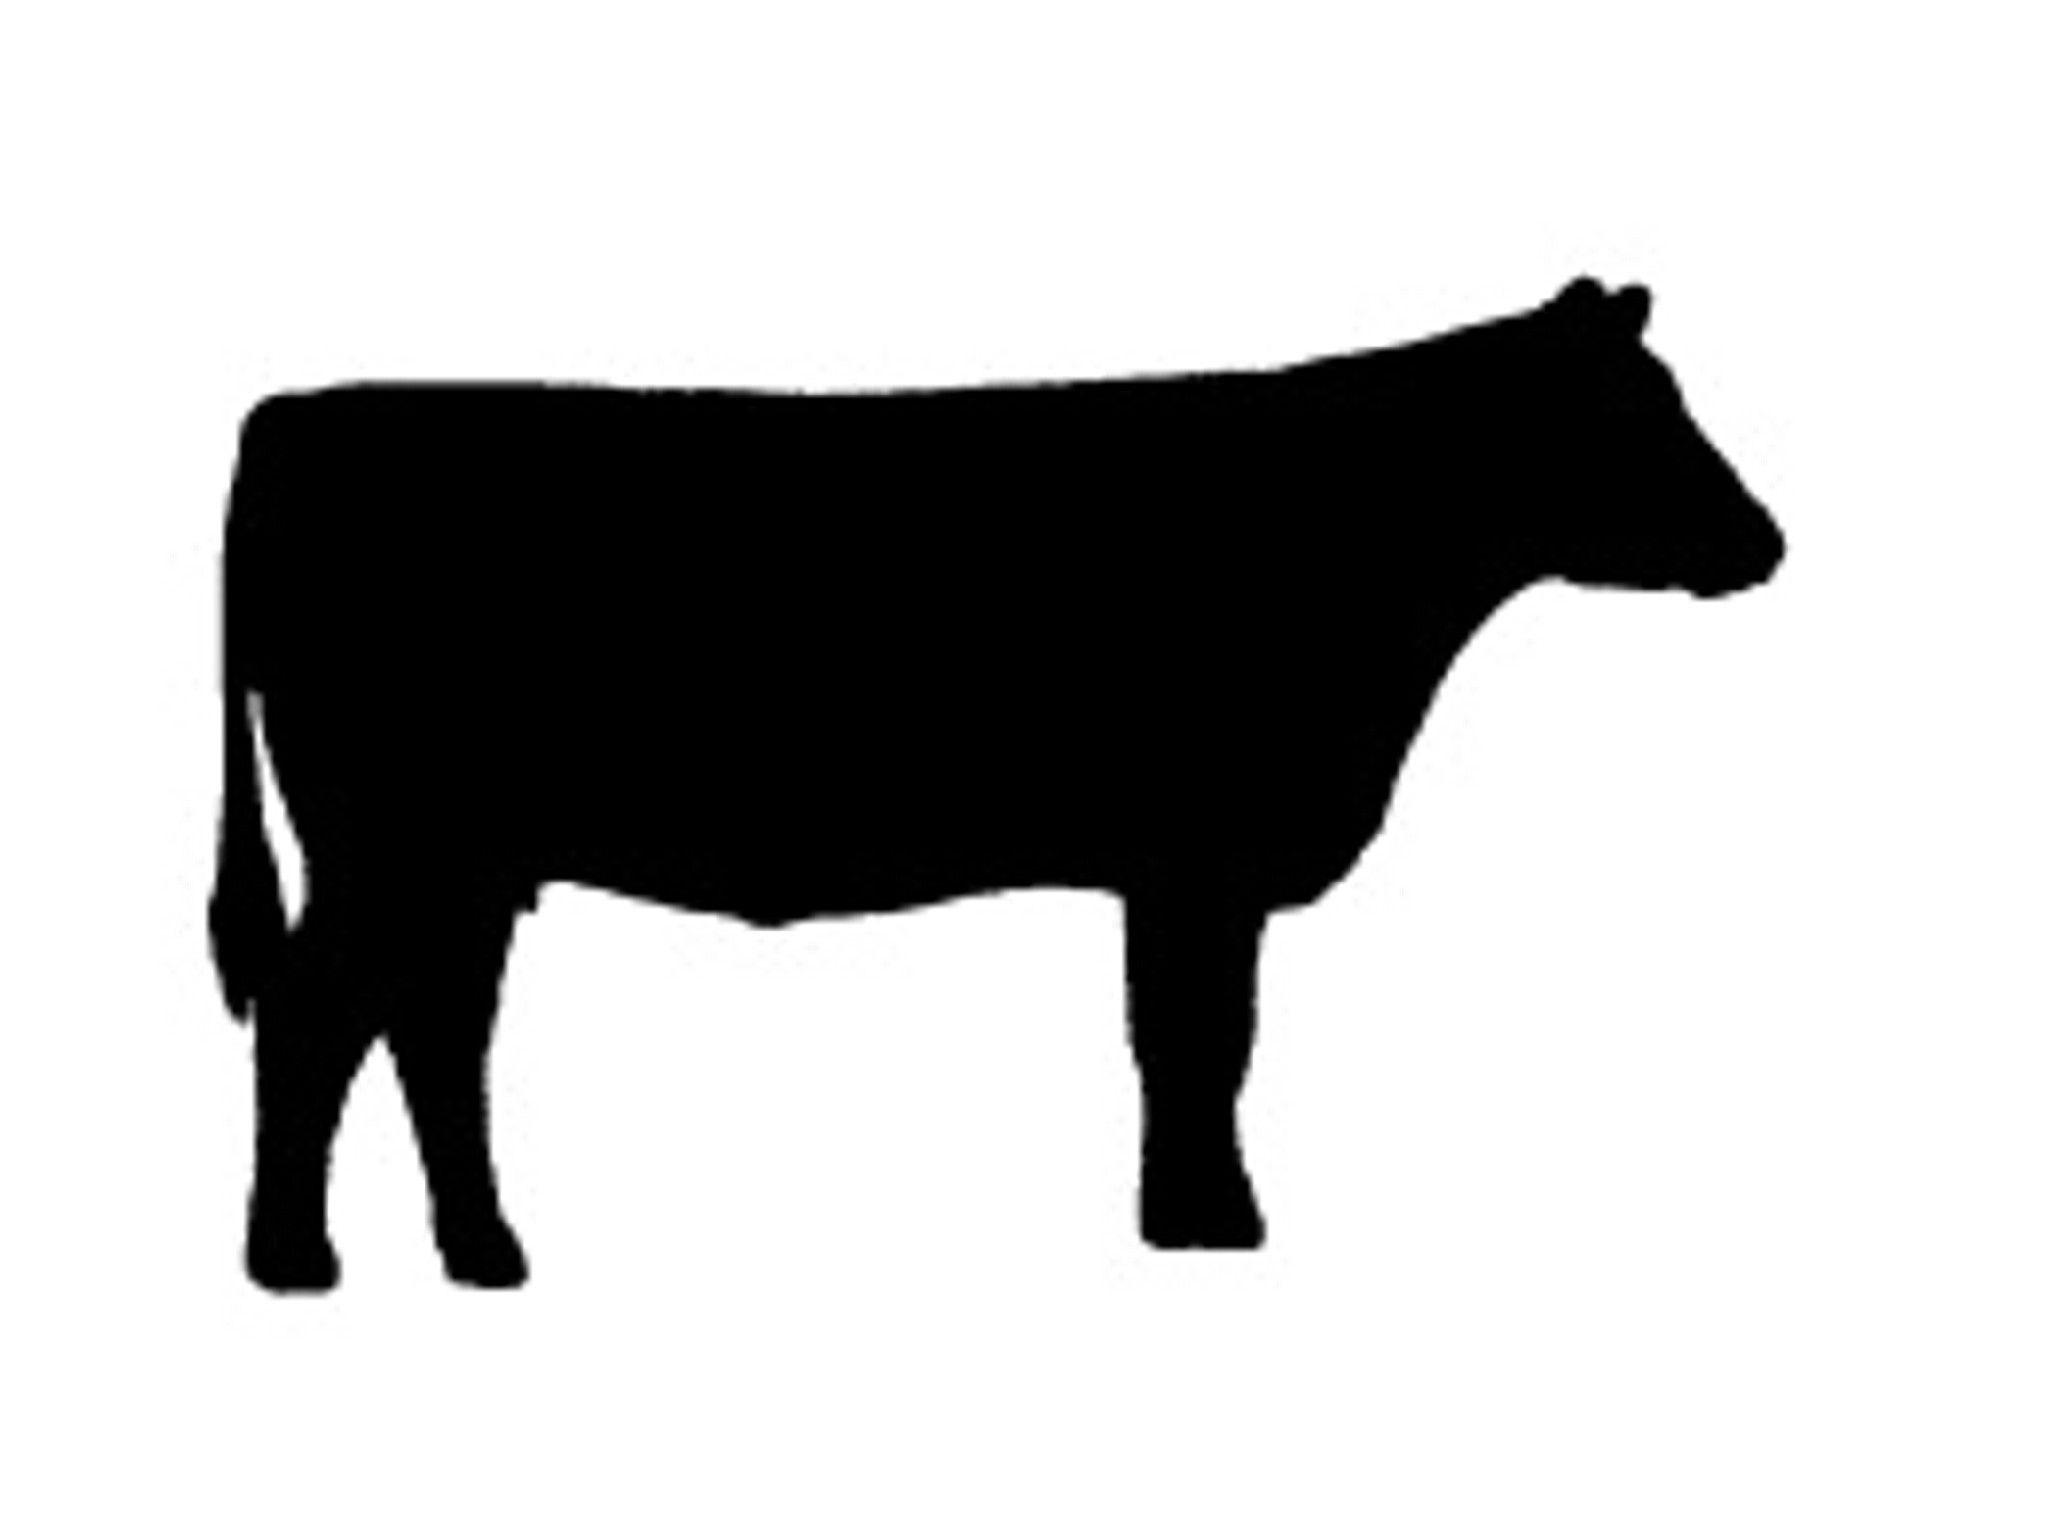 2048x1536 Angus Cow Cattle Decal Vinyl Sticker Car Van Laptop Silhouette